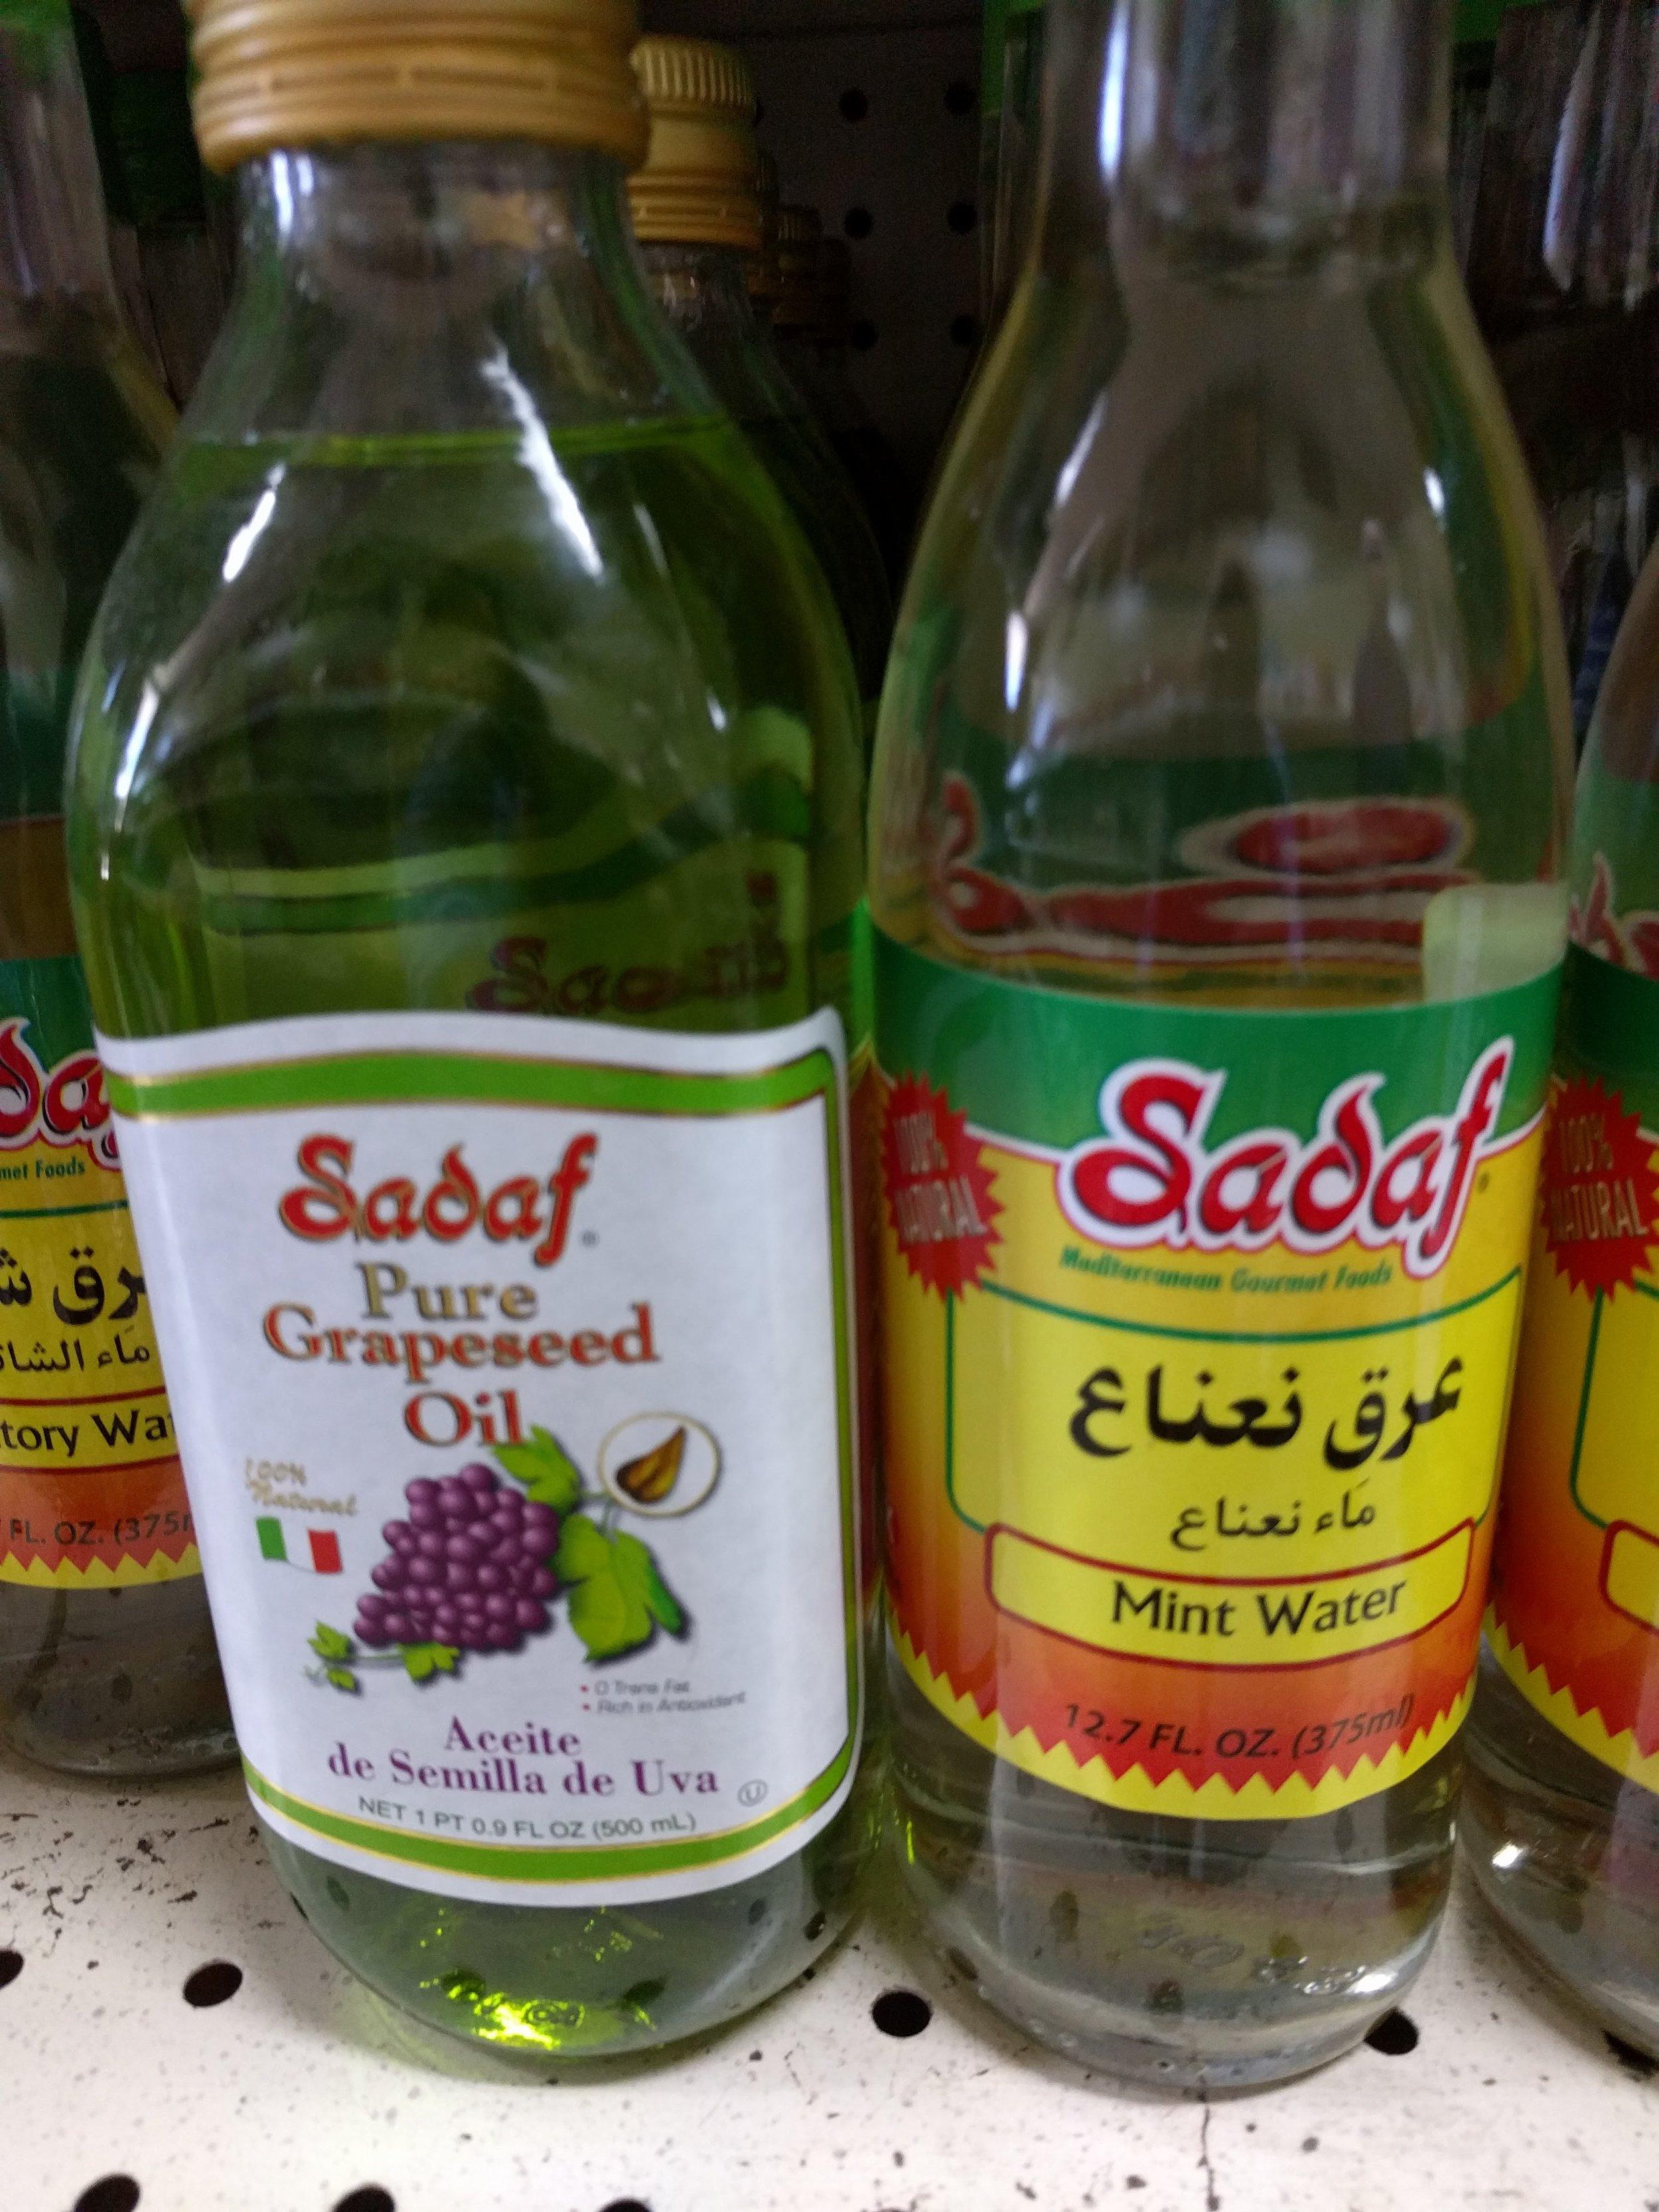 Sadaf-pure-grapeseed-oil-Pak-Halal-International-Foods-12259-W-87th-St-Pkwy-Lenexa-KS-66215.jpg